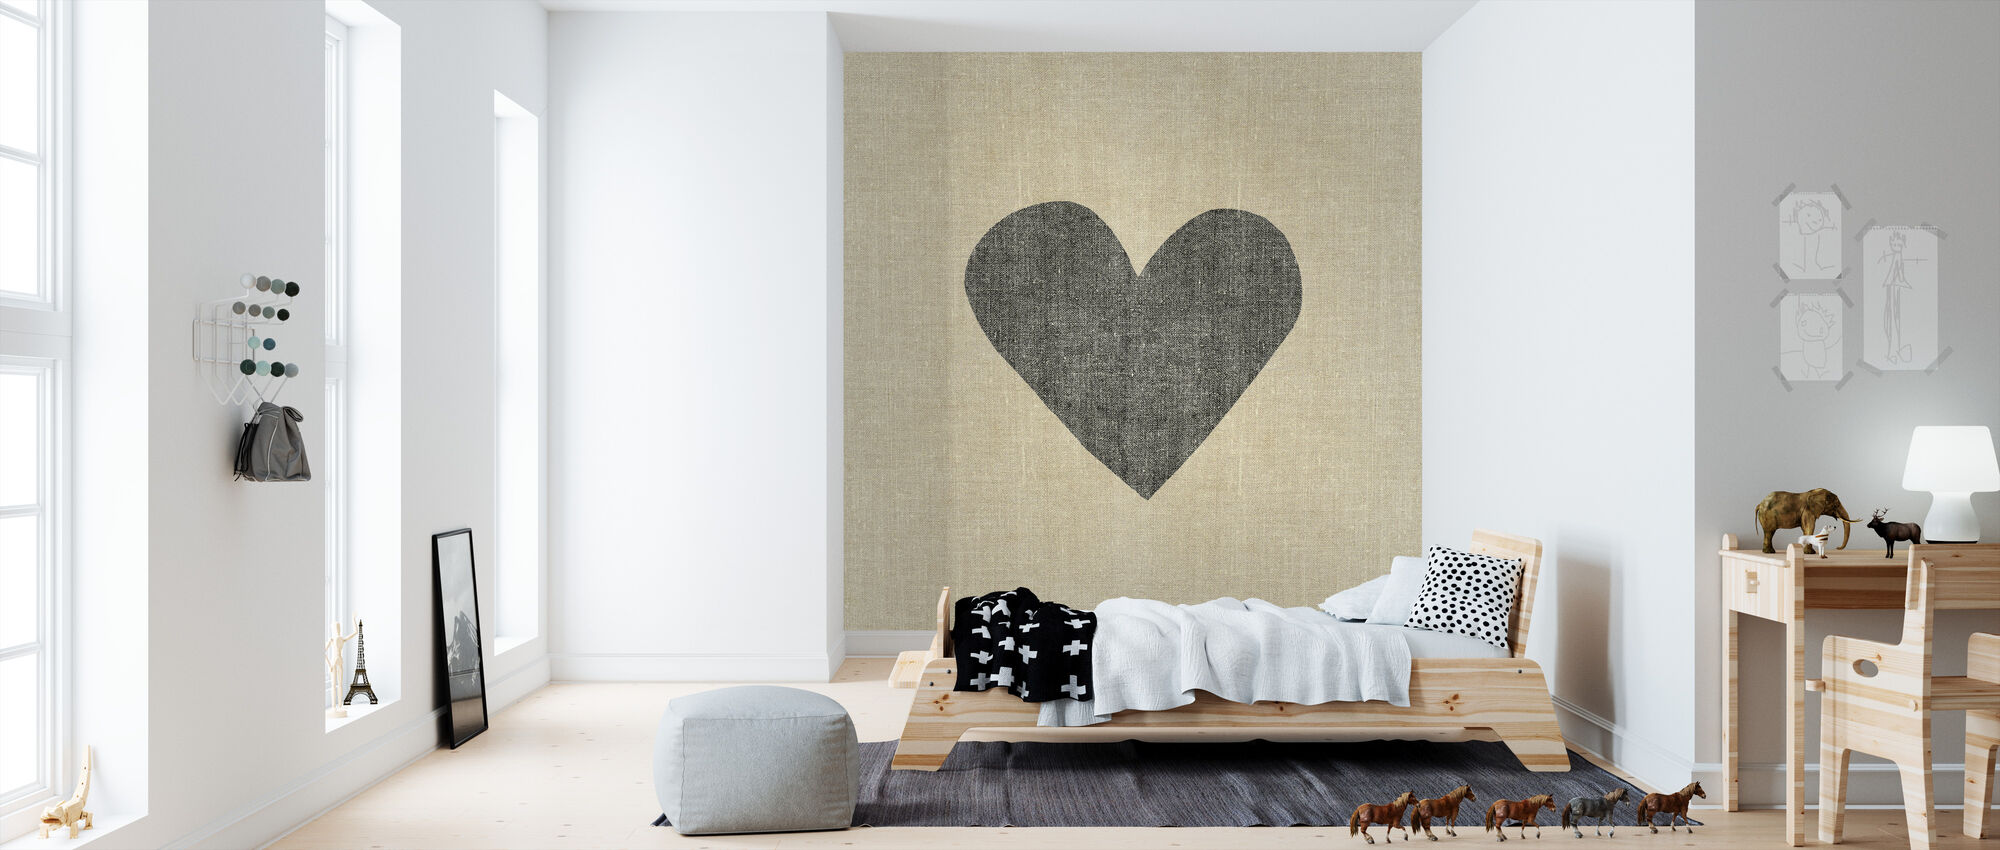 Simple Message Heart - Wallpaper - Kids Room